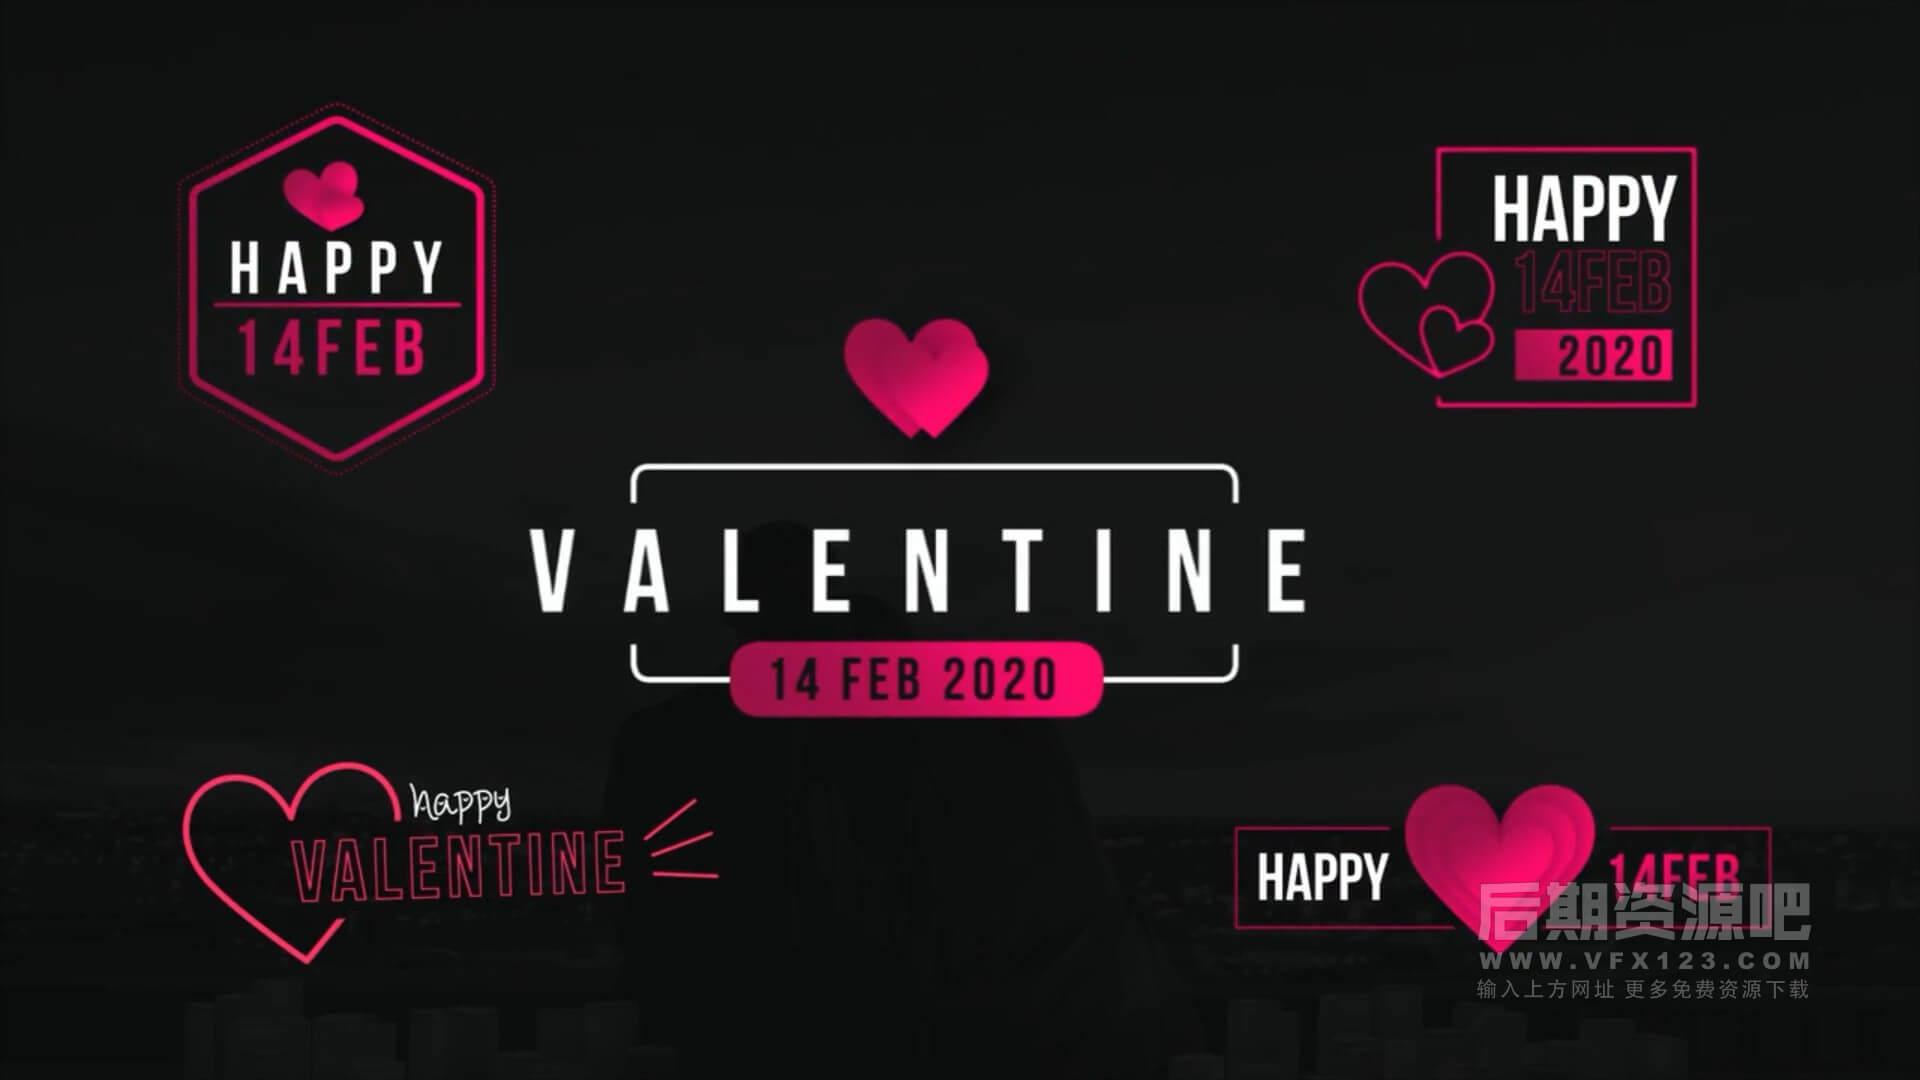 Fcpx插件 10组爱心桃心装饰 情人节婚礼人名日期字幕标题 Valentine titles